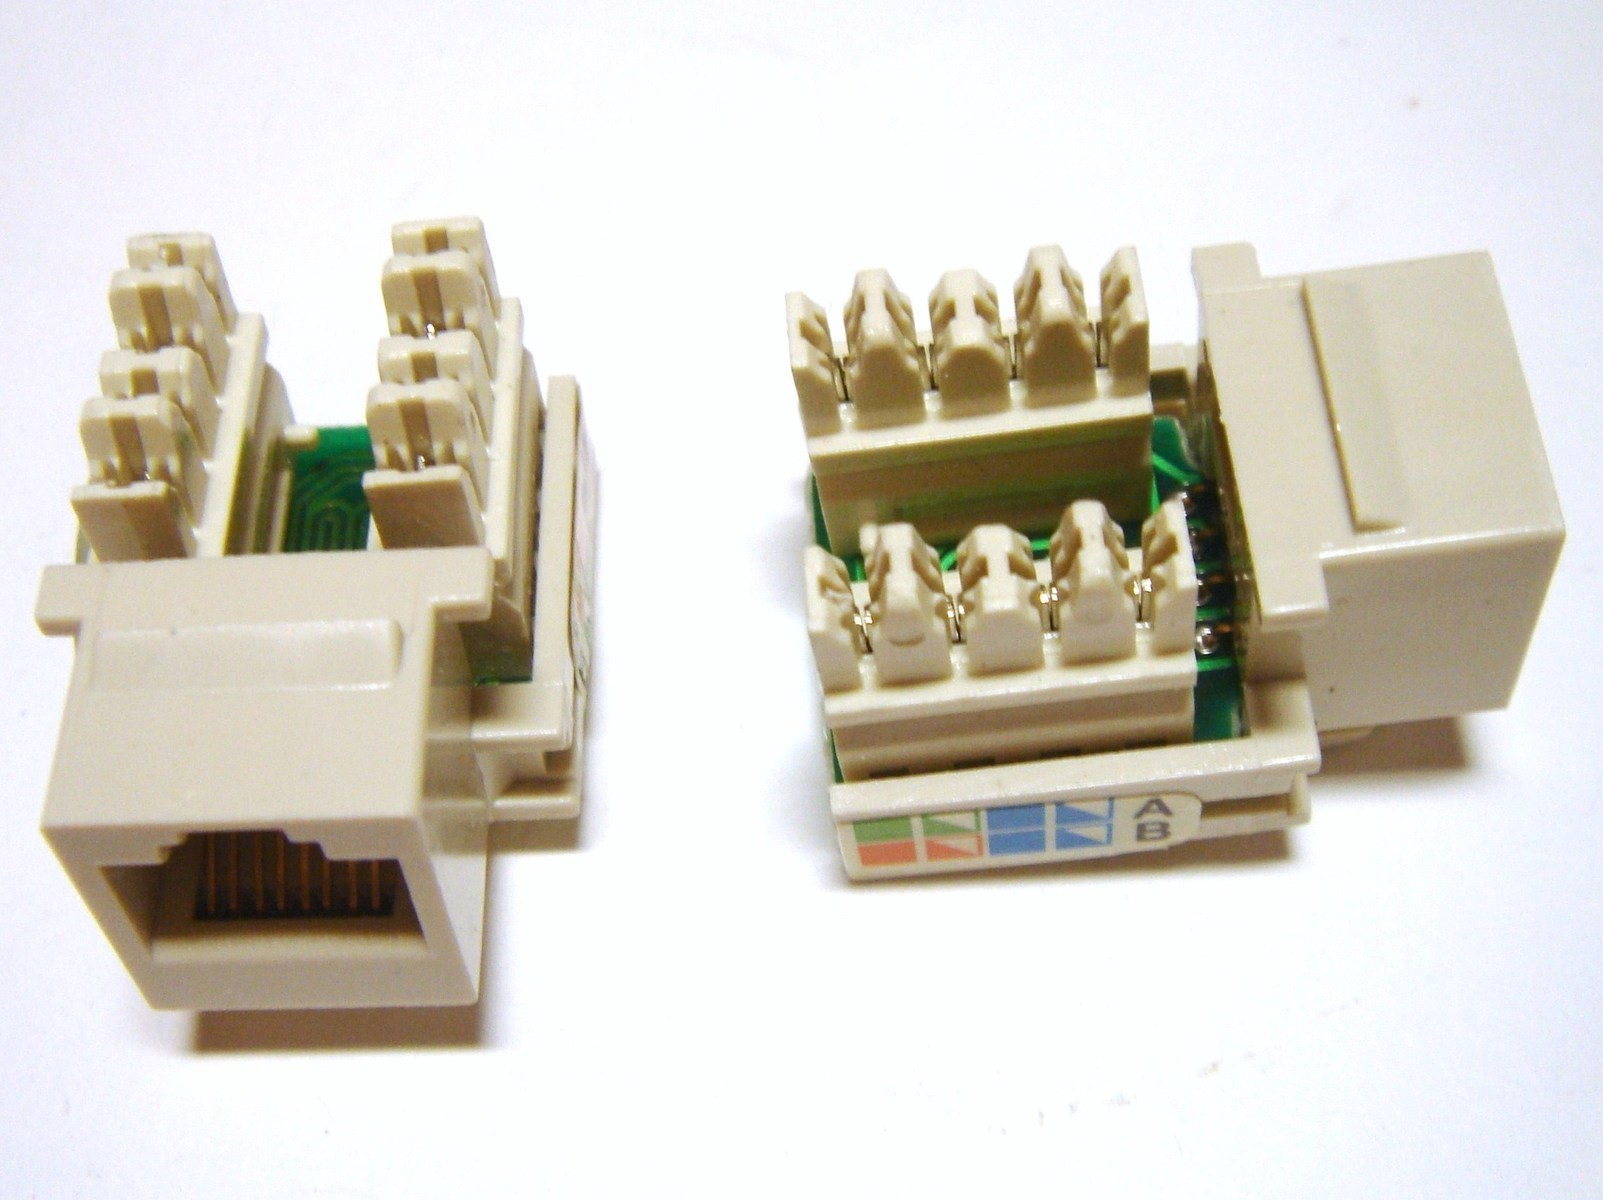 Arvuti pistikupesa RJ45, A-lan